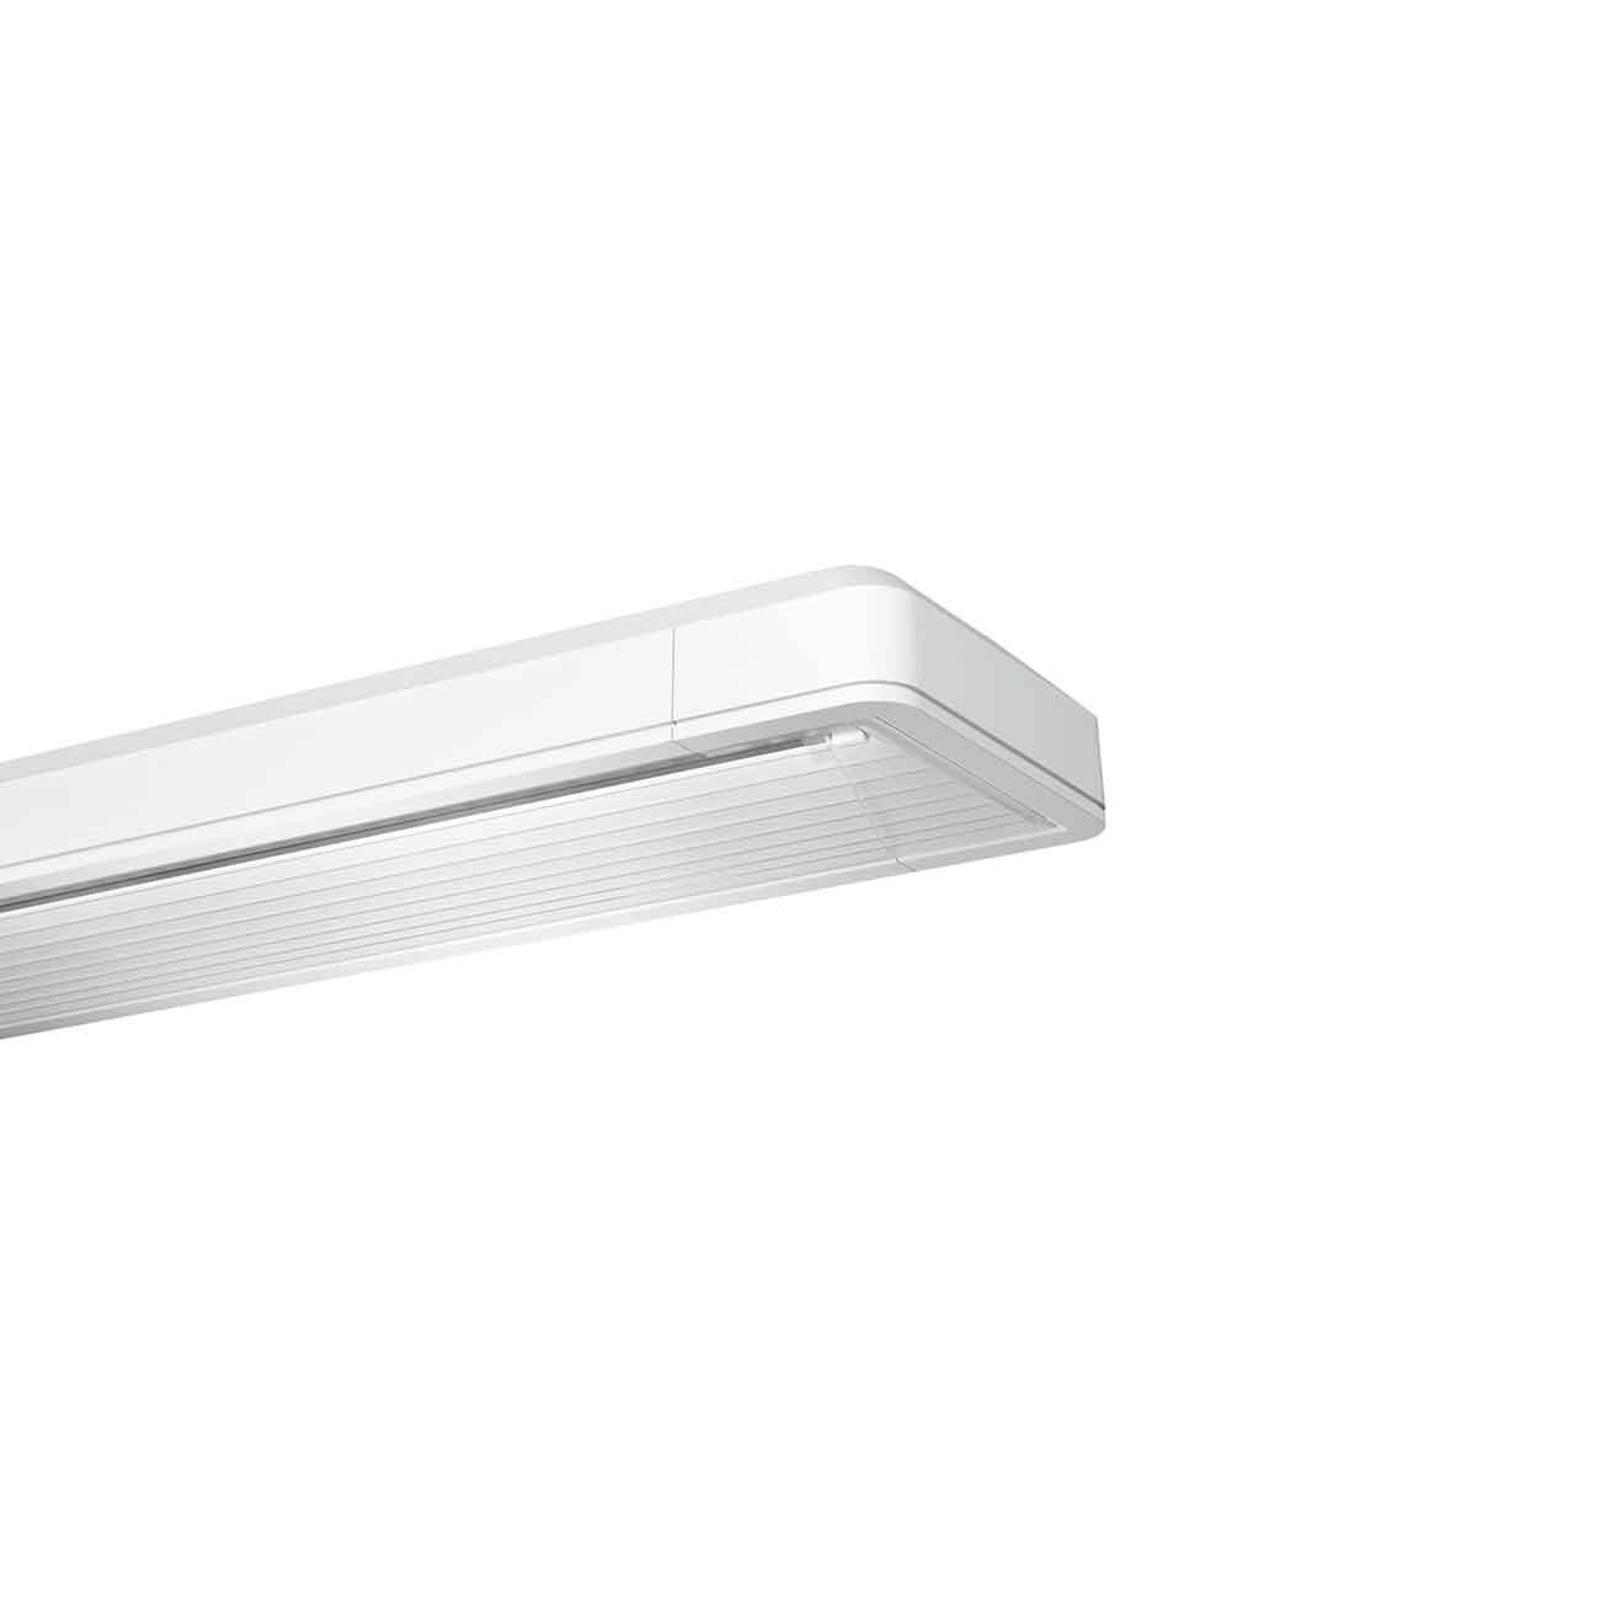 Siteco Taris lampa sufitowa LED 123cm EVG